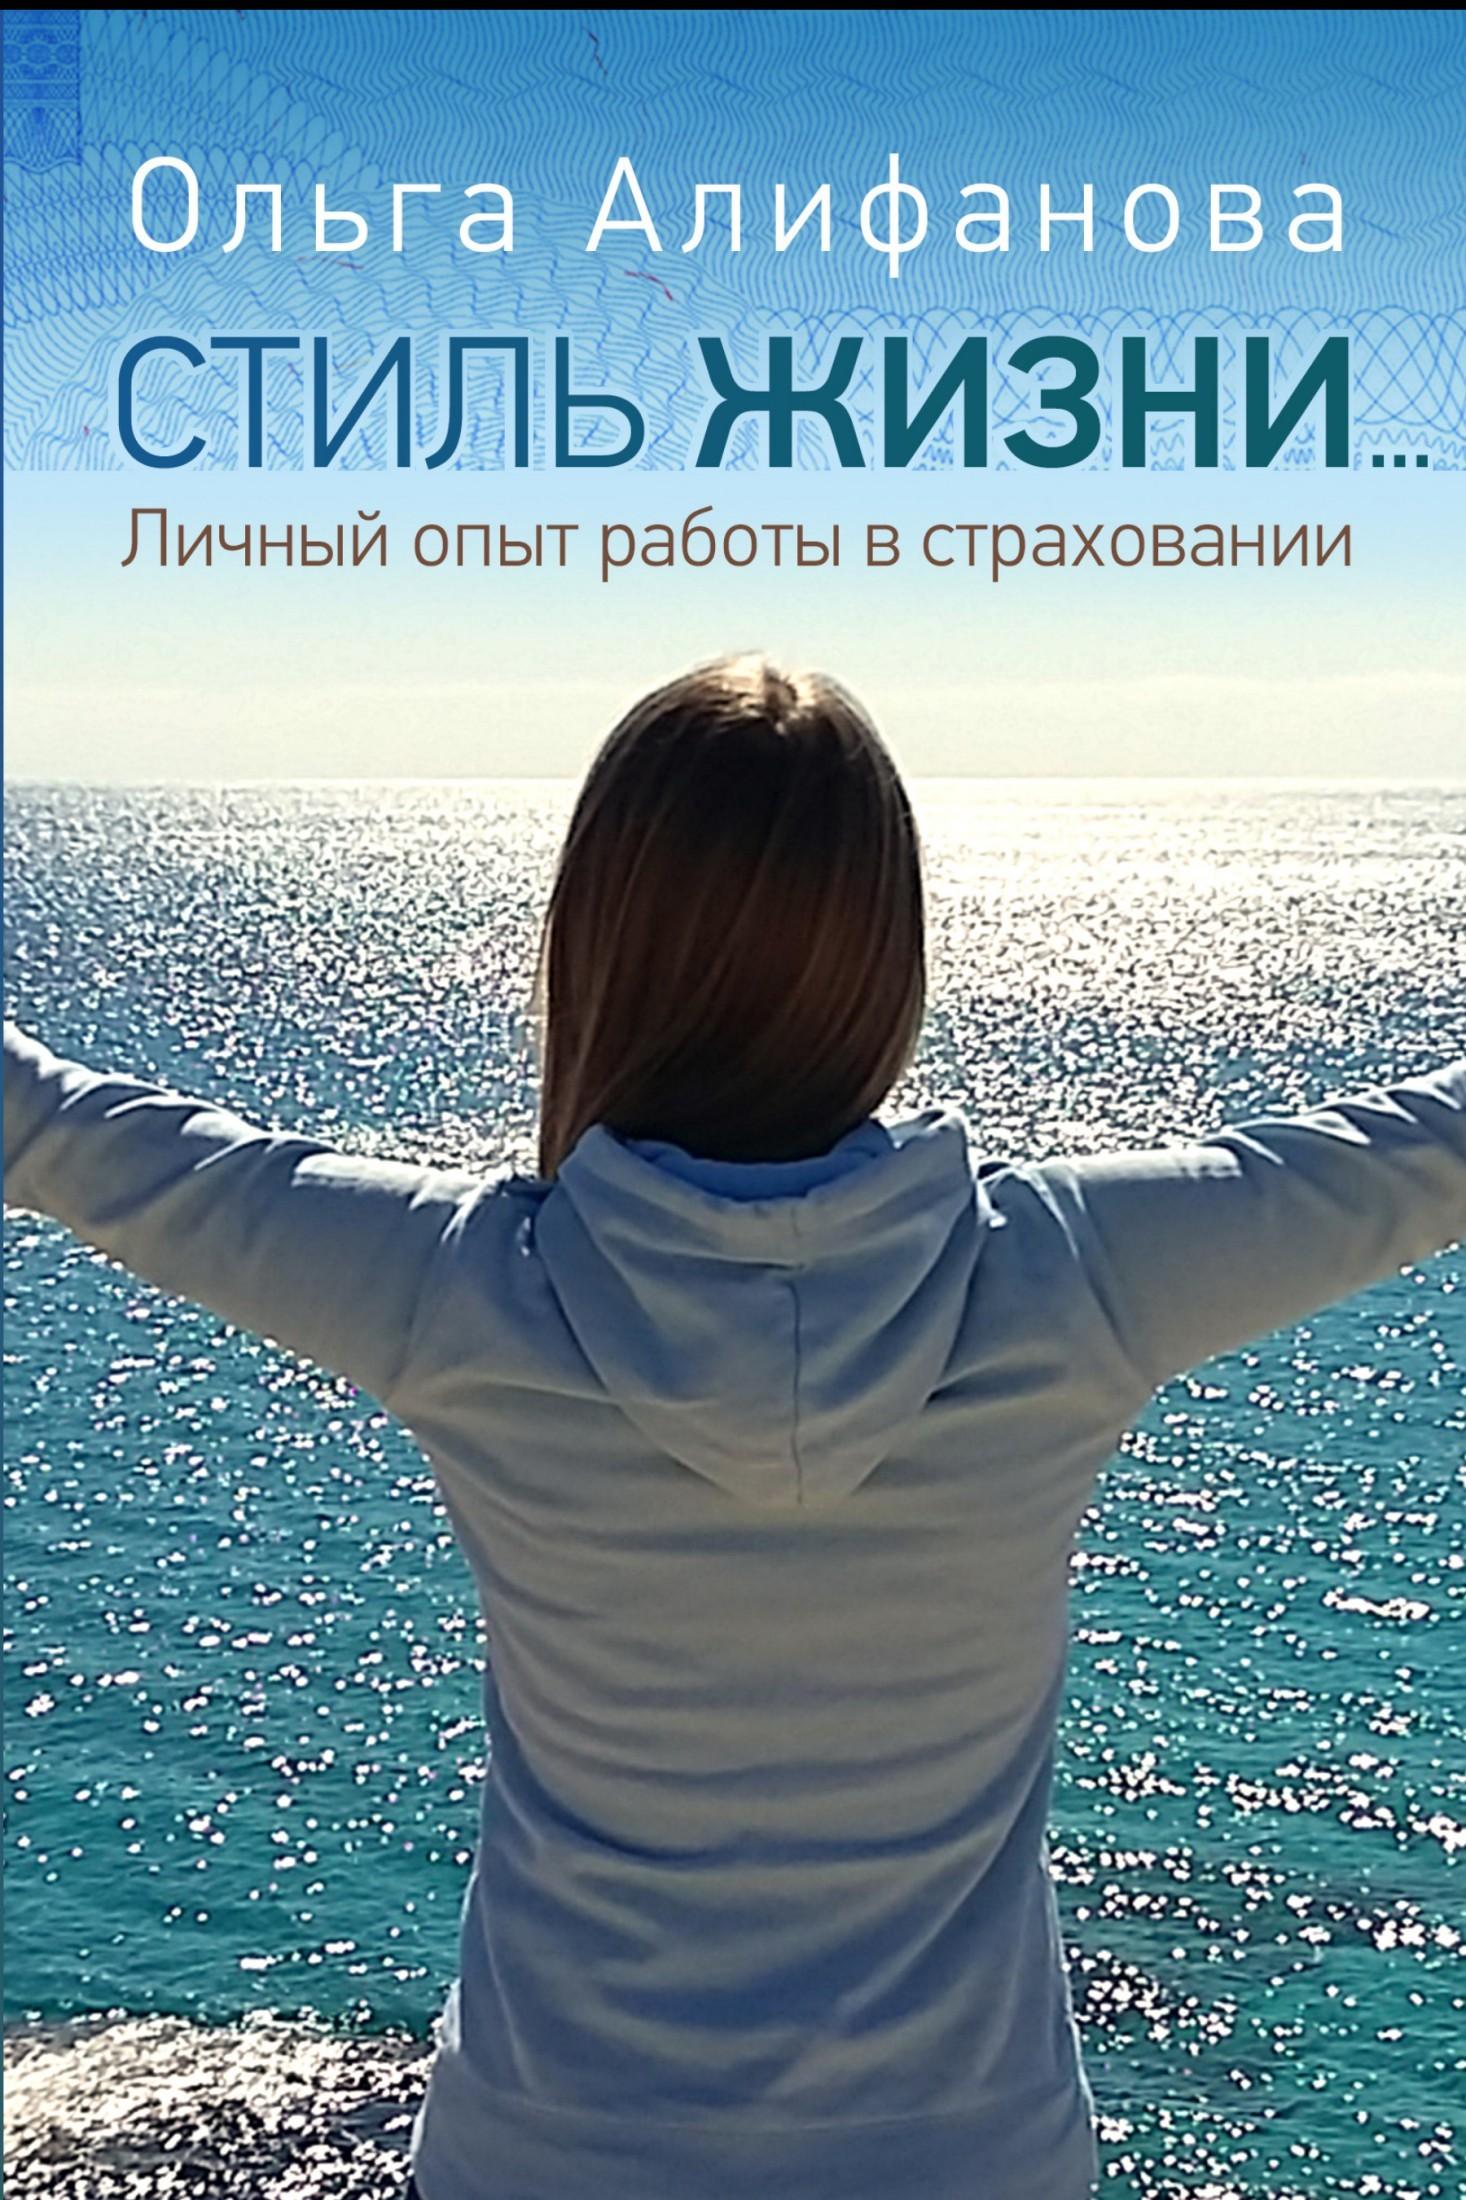 Обложка книги. Автор - Ольга Алифанова